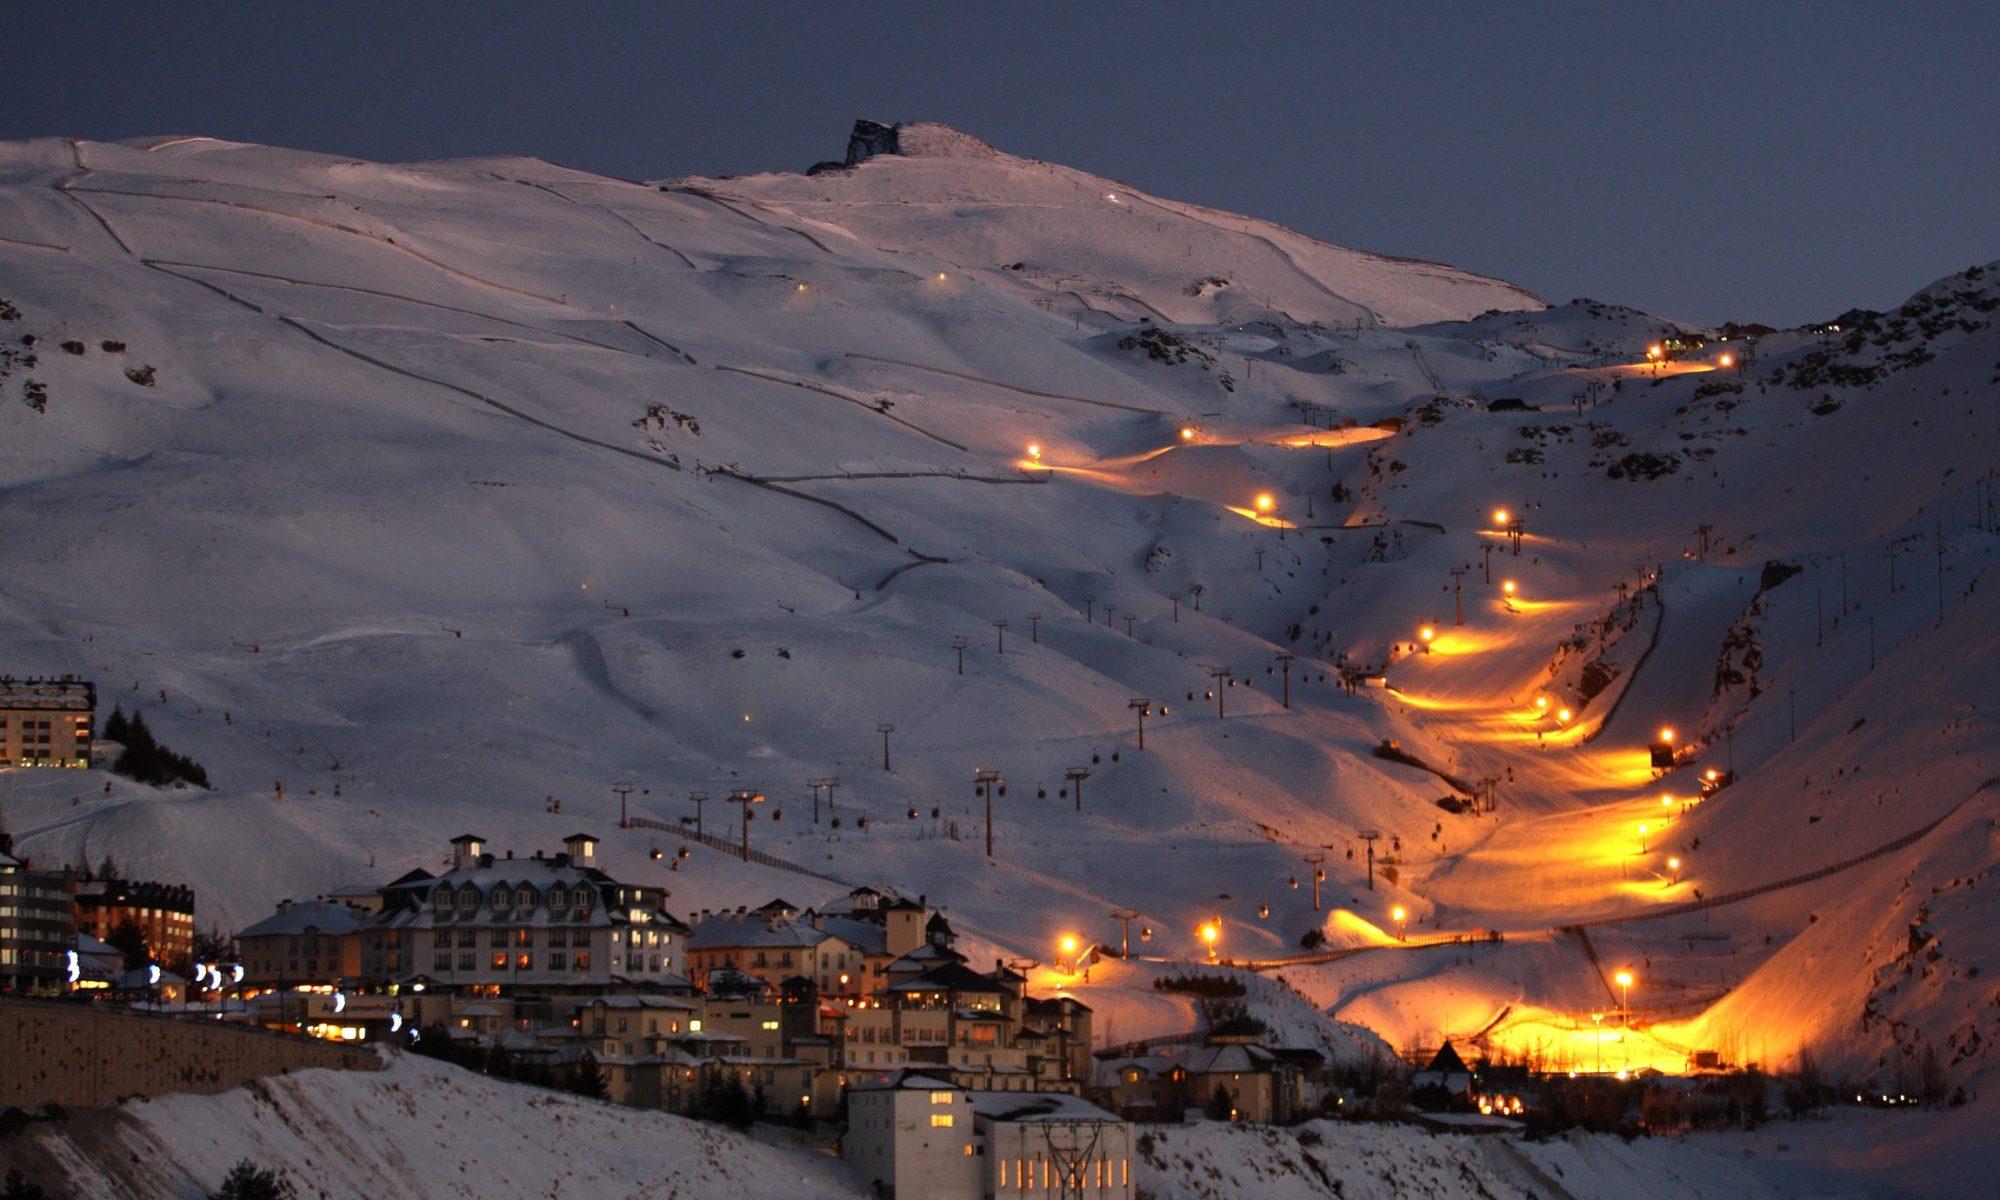 Night Skiing at Sierra Nevada